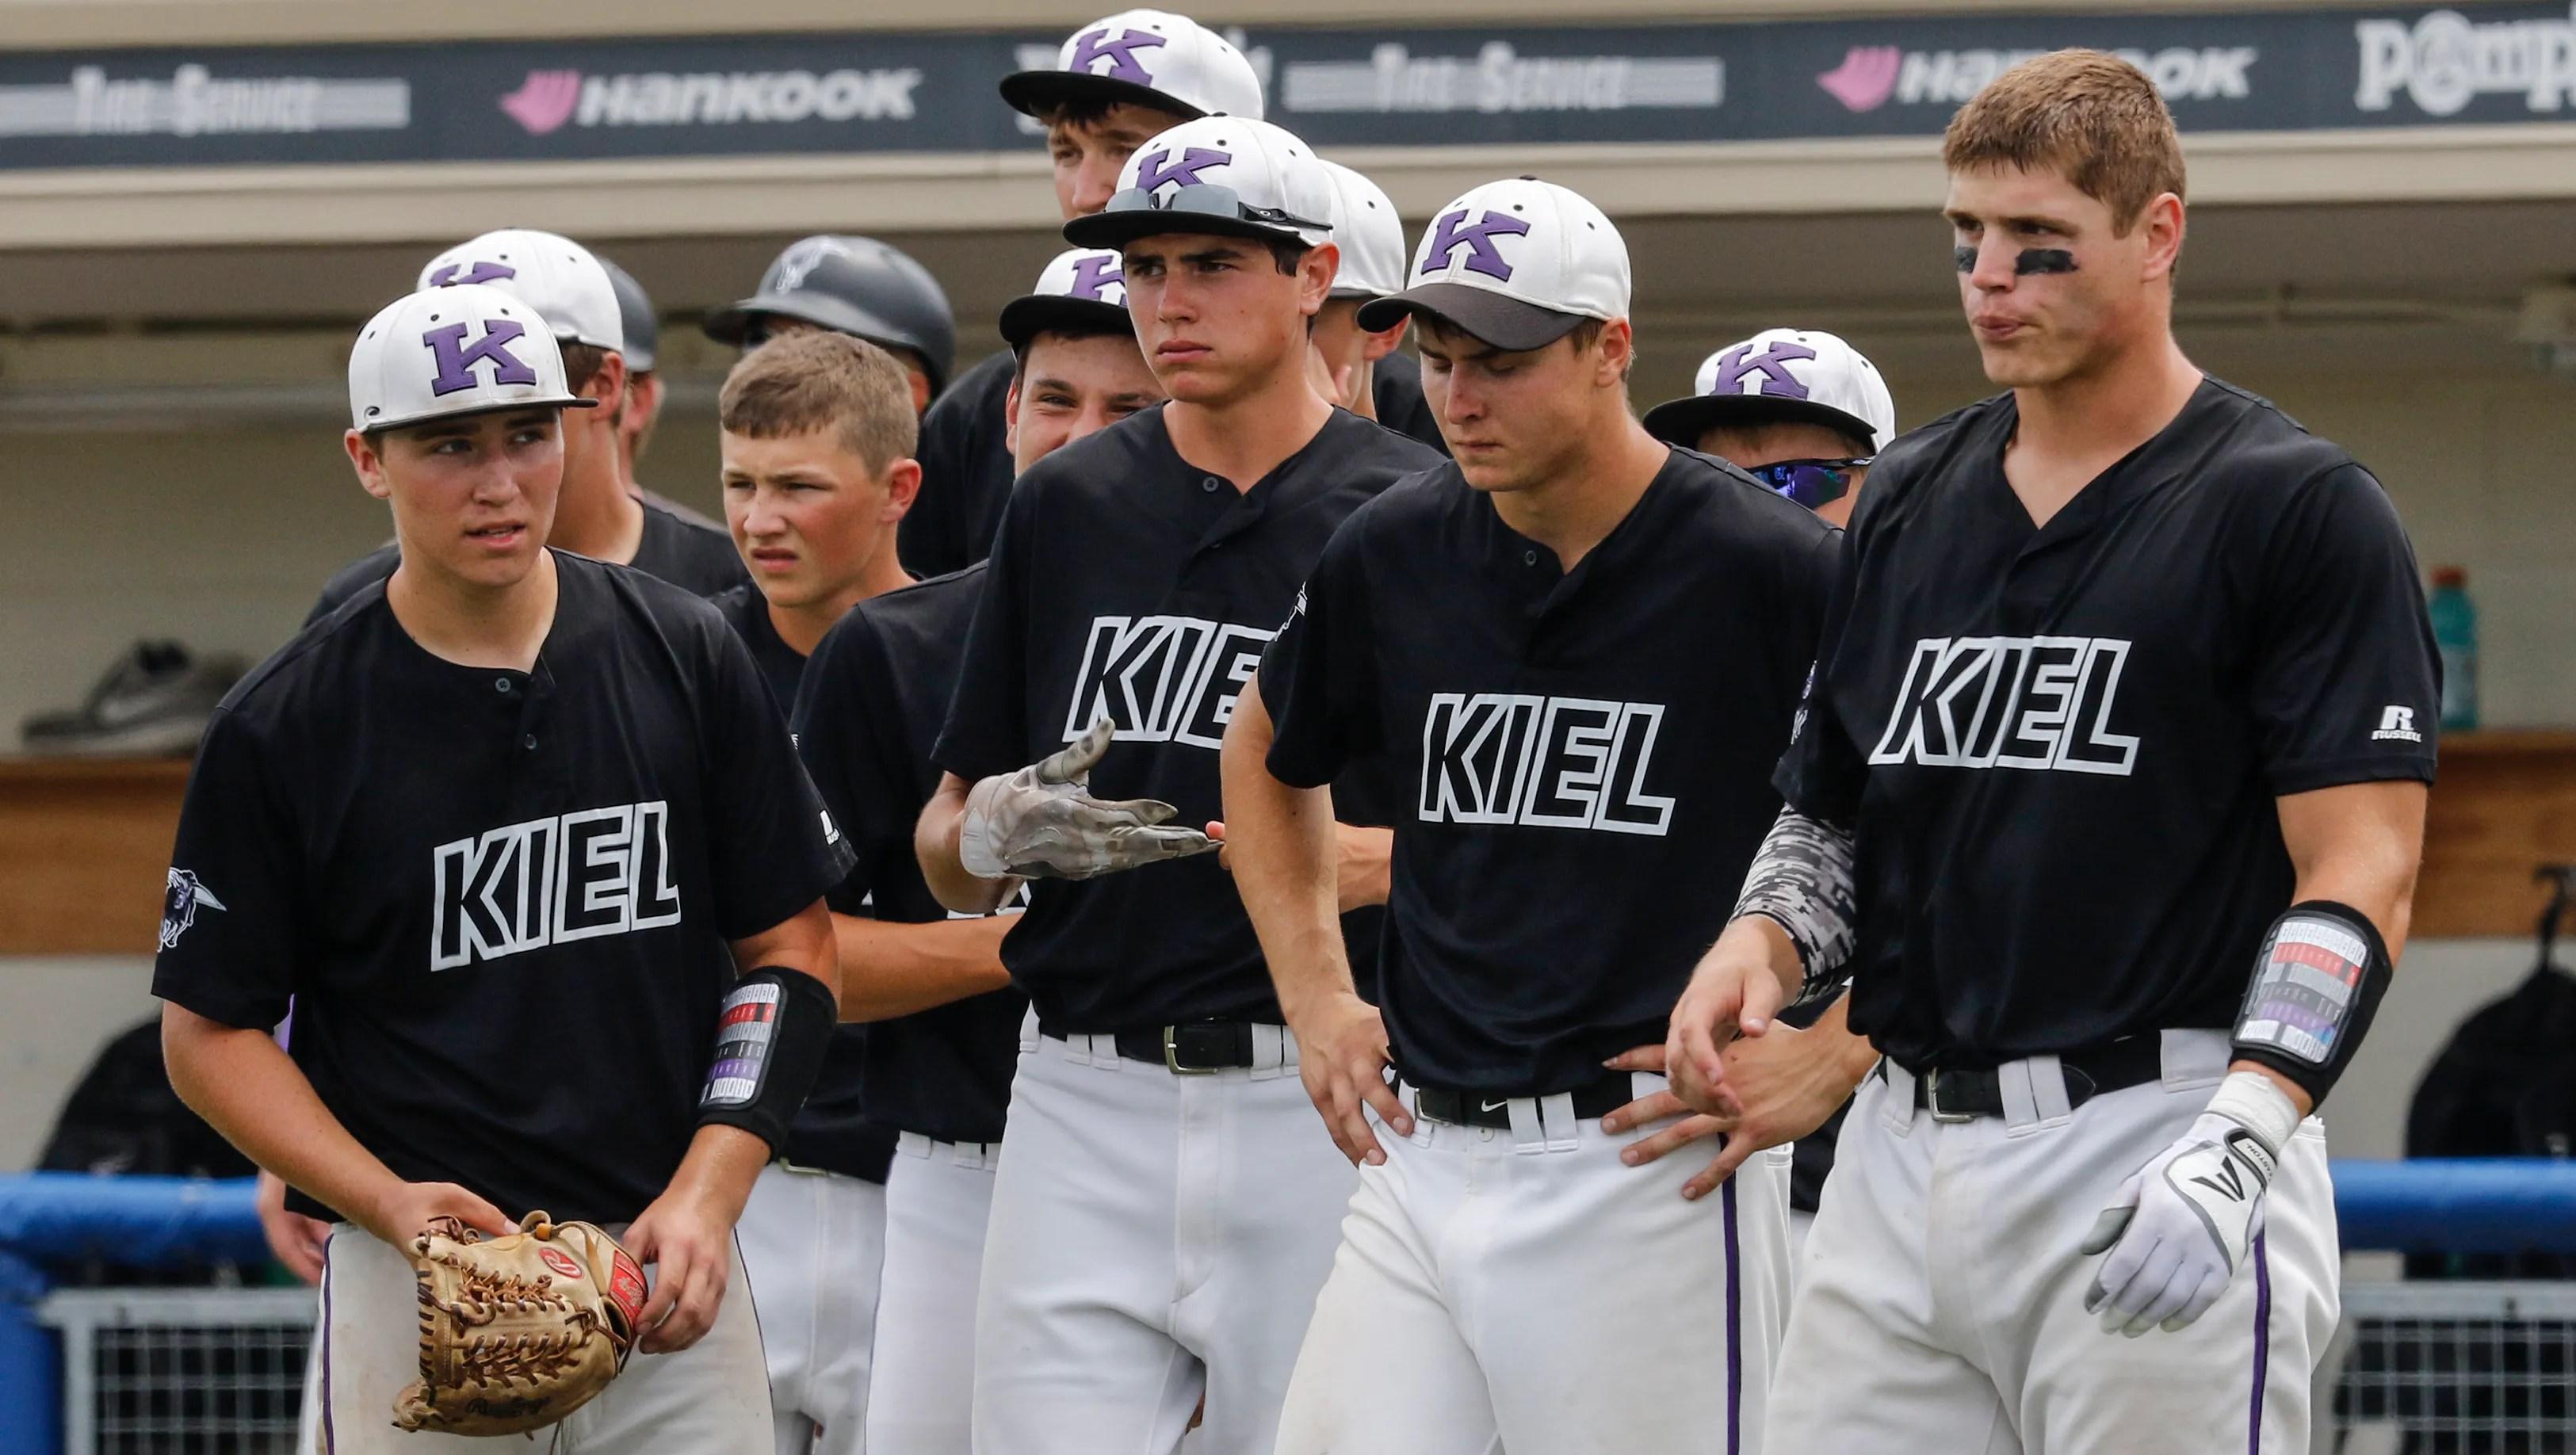 Kiel Falls Marquette In Wiaa State Summer Baseball Semifinal